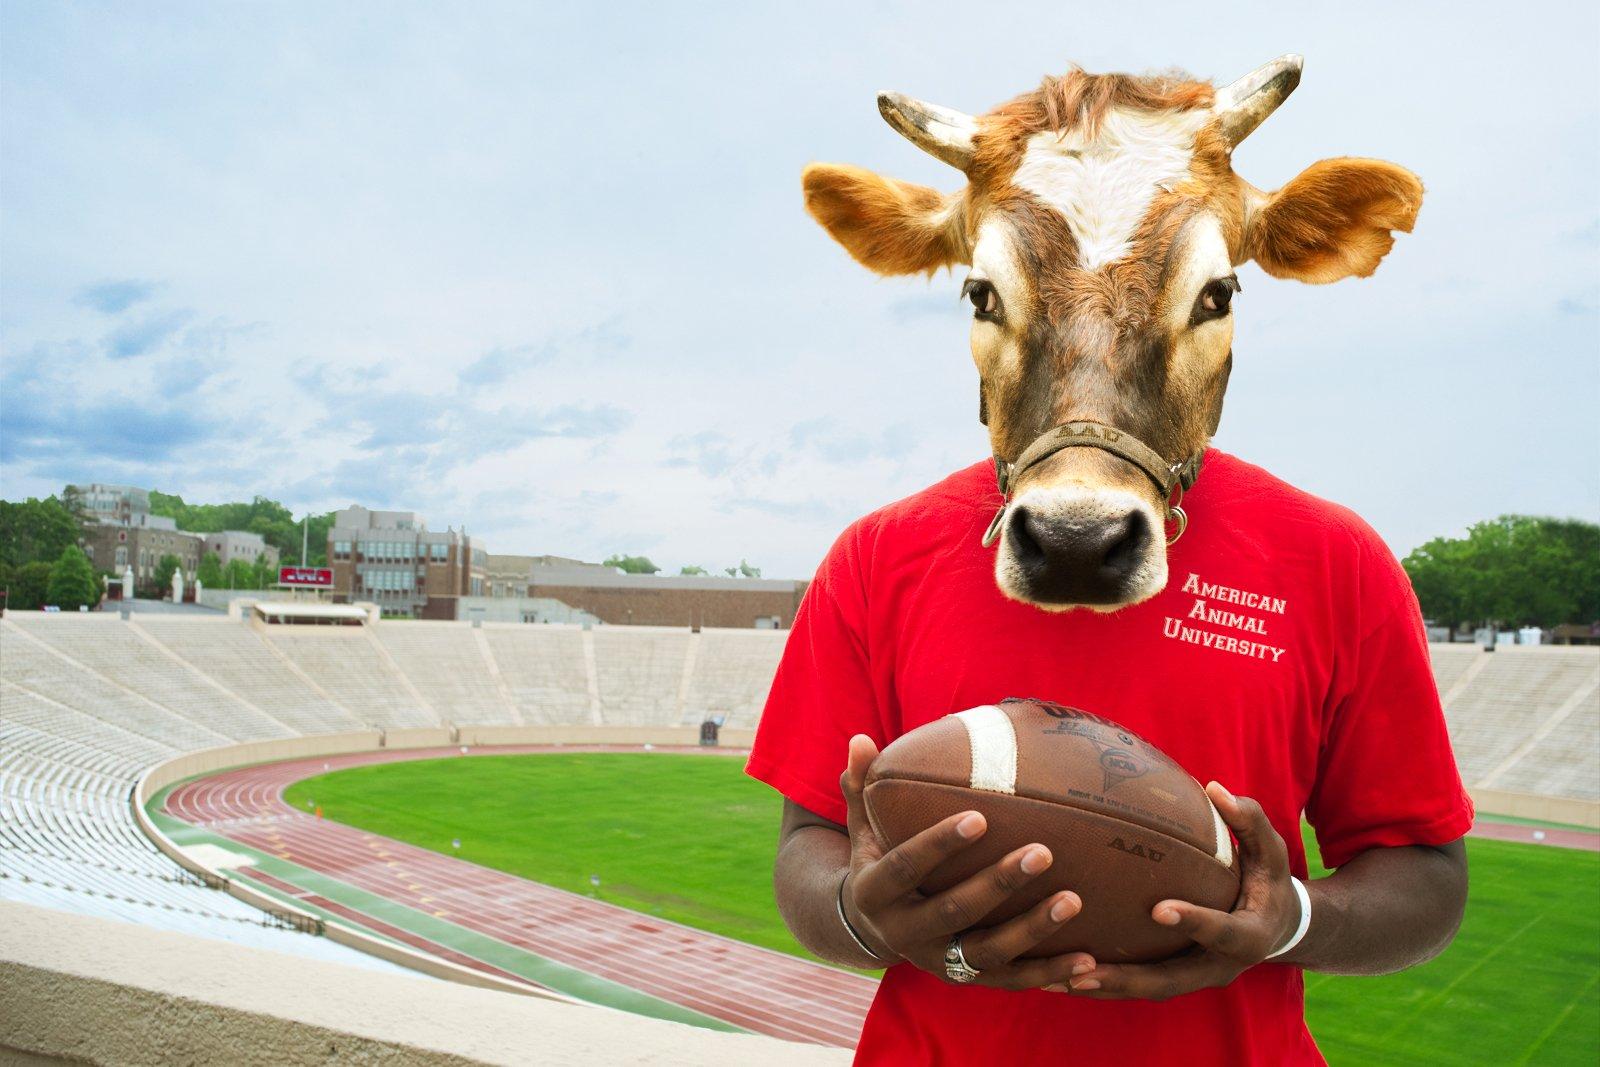 Bull Player